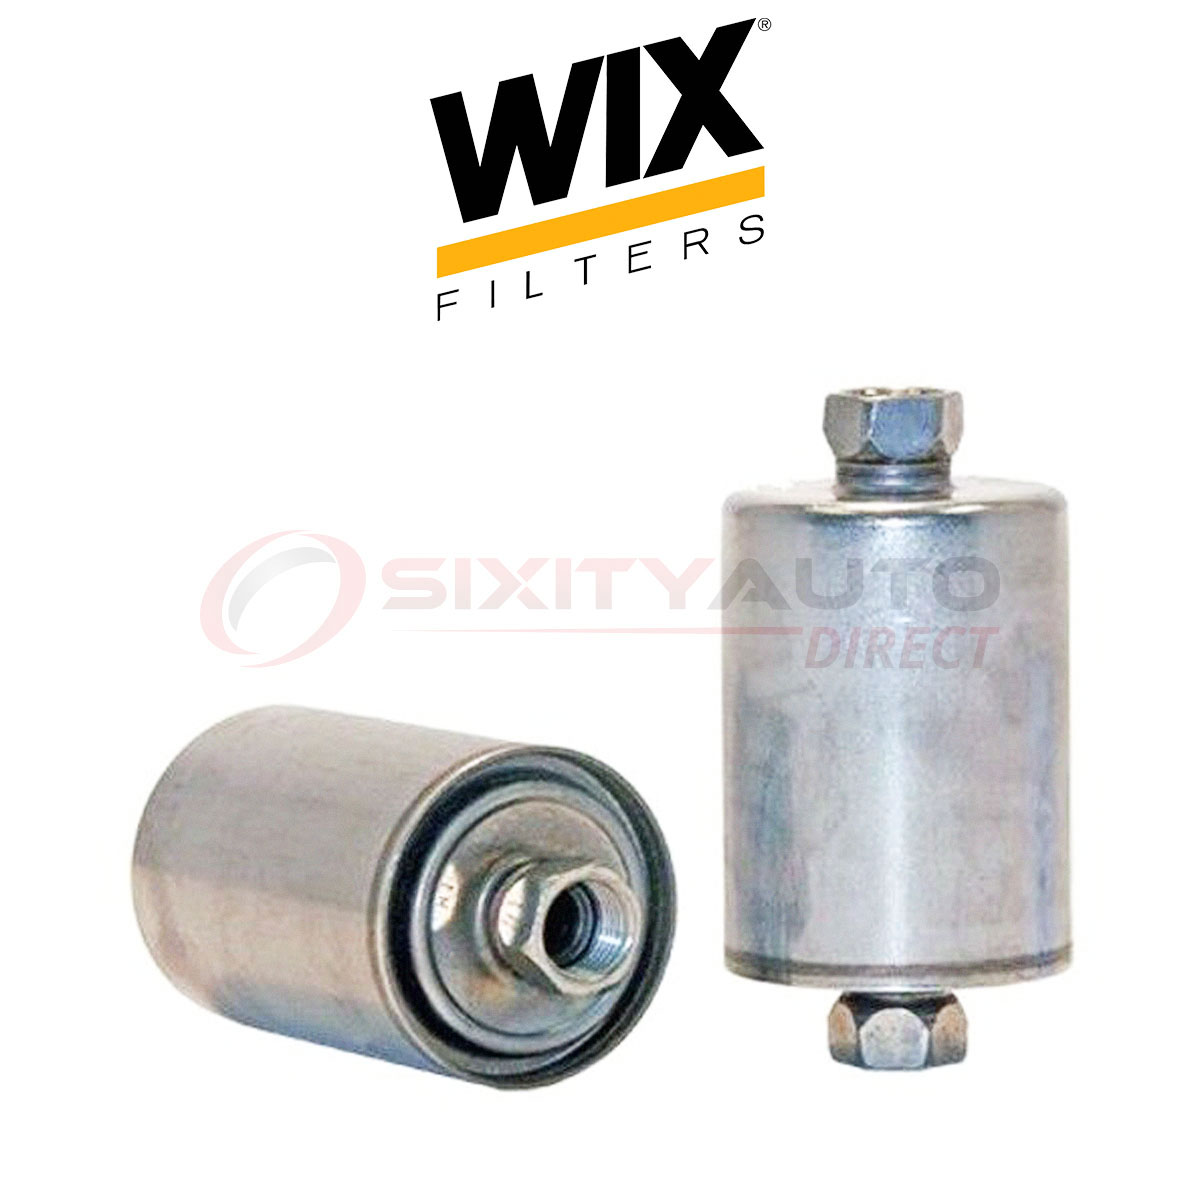 WIX Fuel Filter for 4000 4000 Chevrolet Silverado 4000 400.400L 400.40L ...